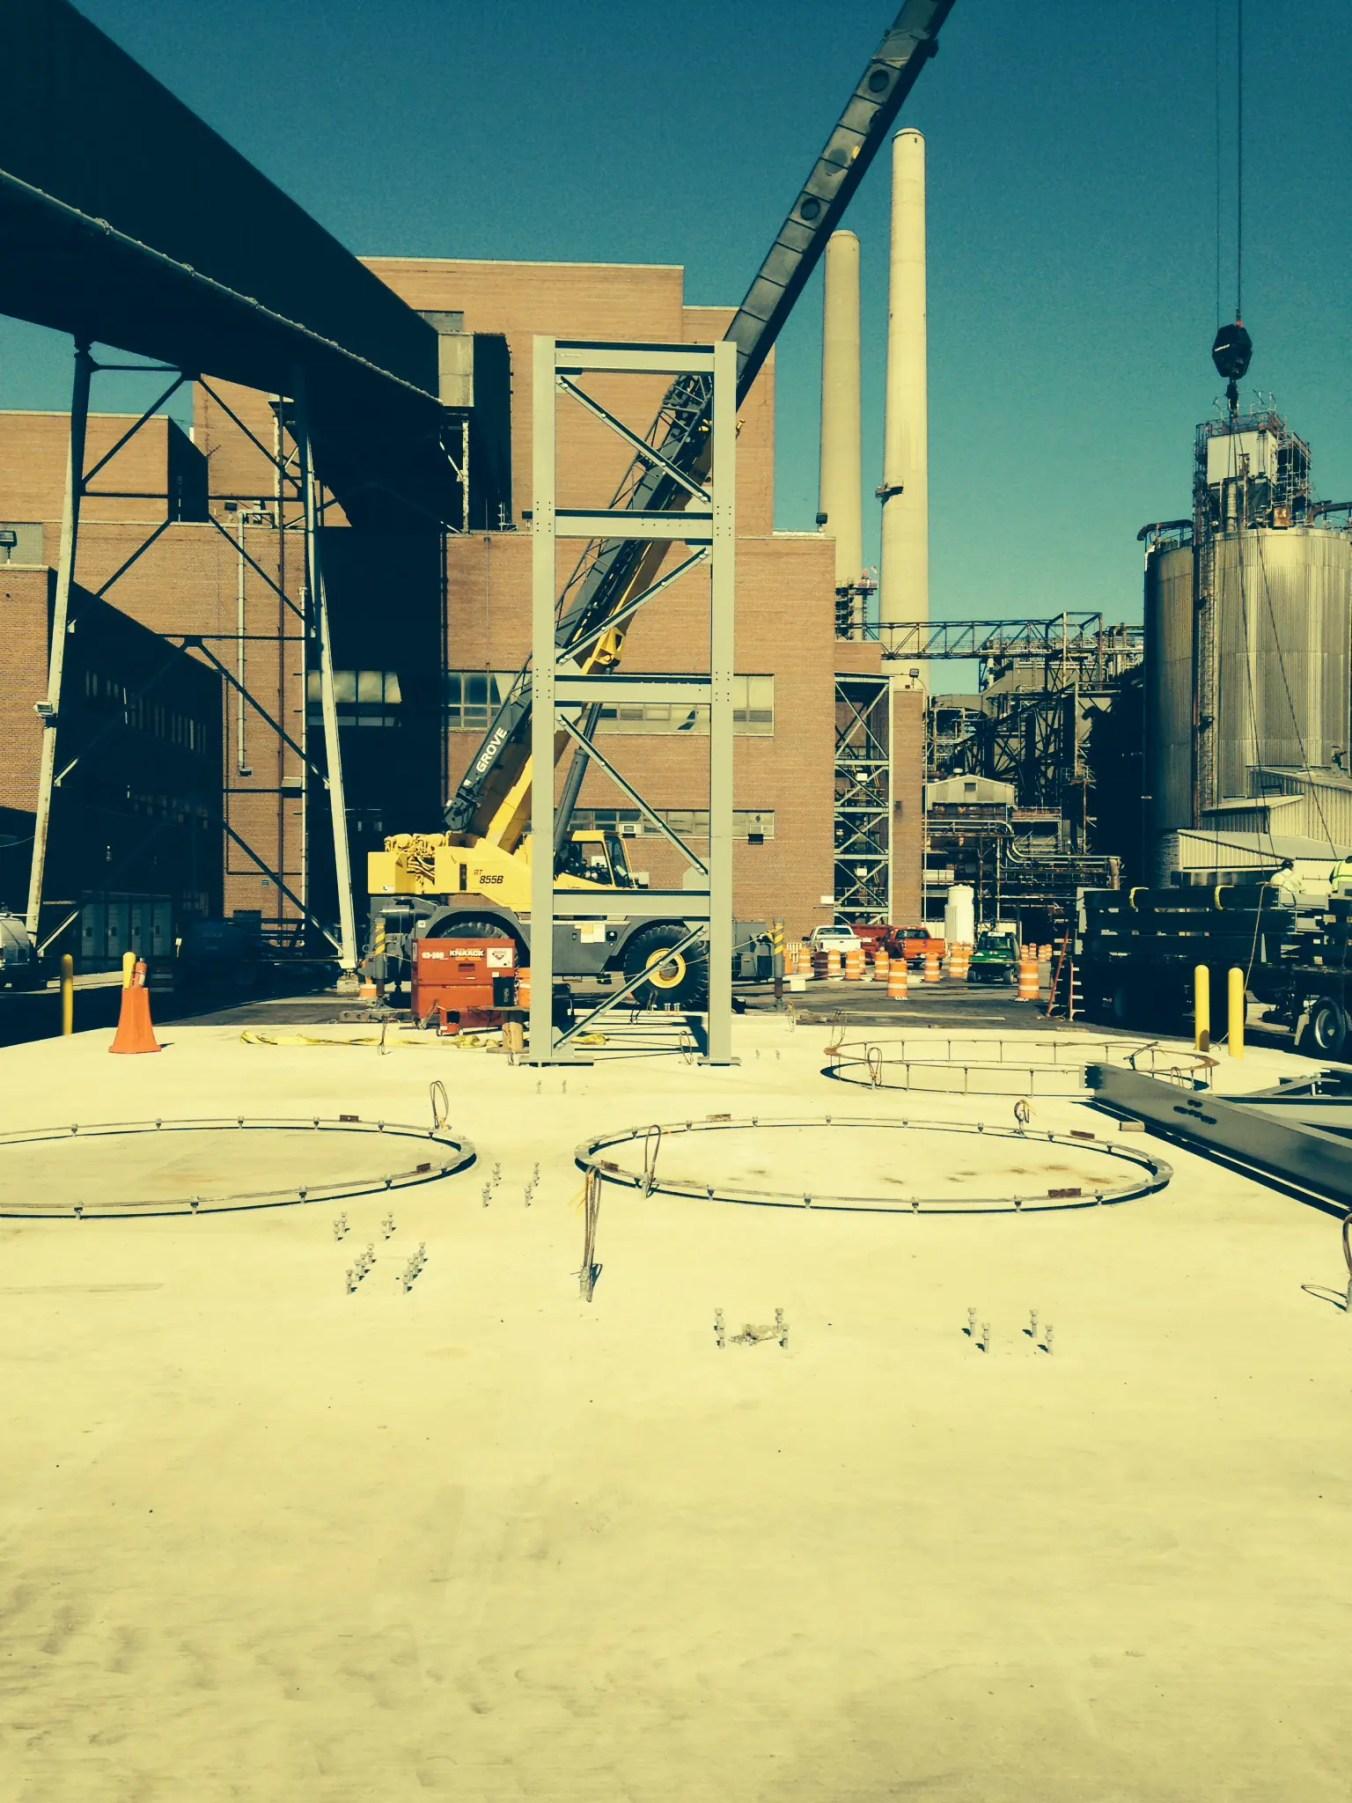 Exterior view of St Clair Compressor Station with crane